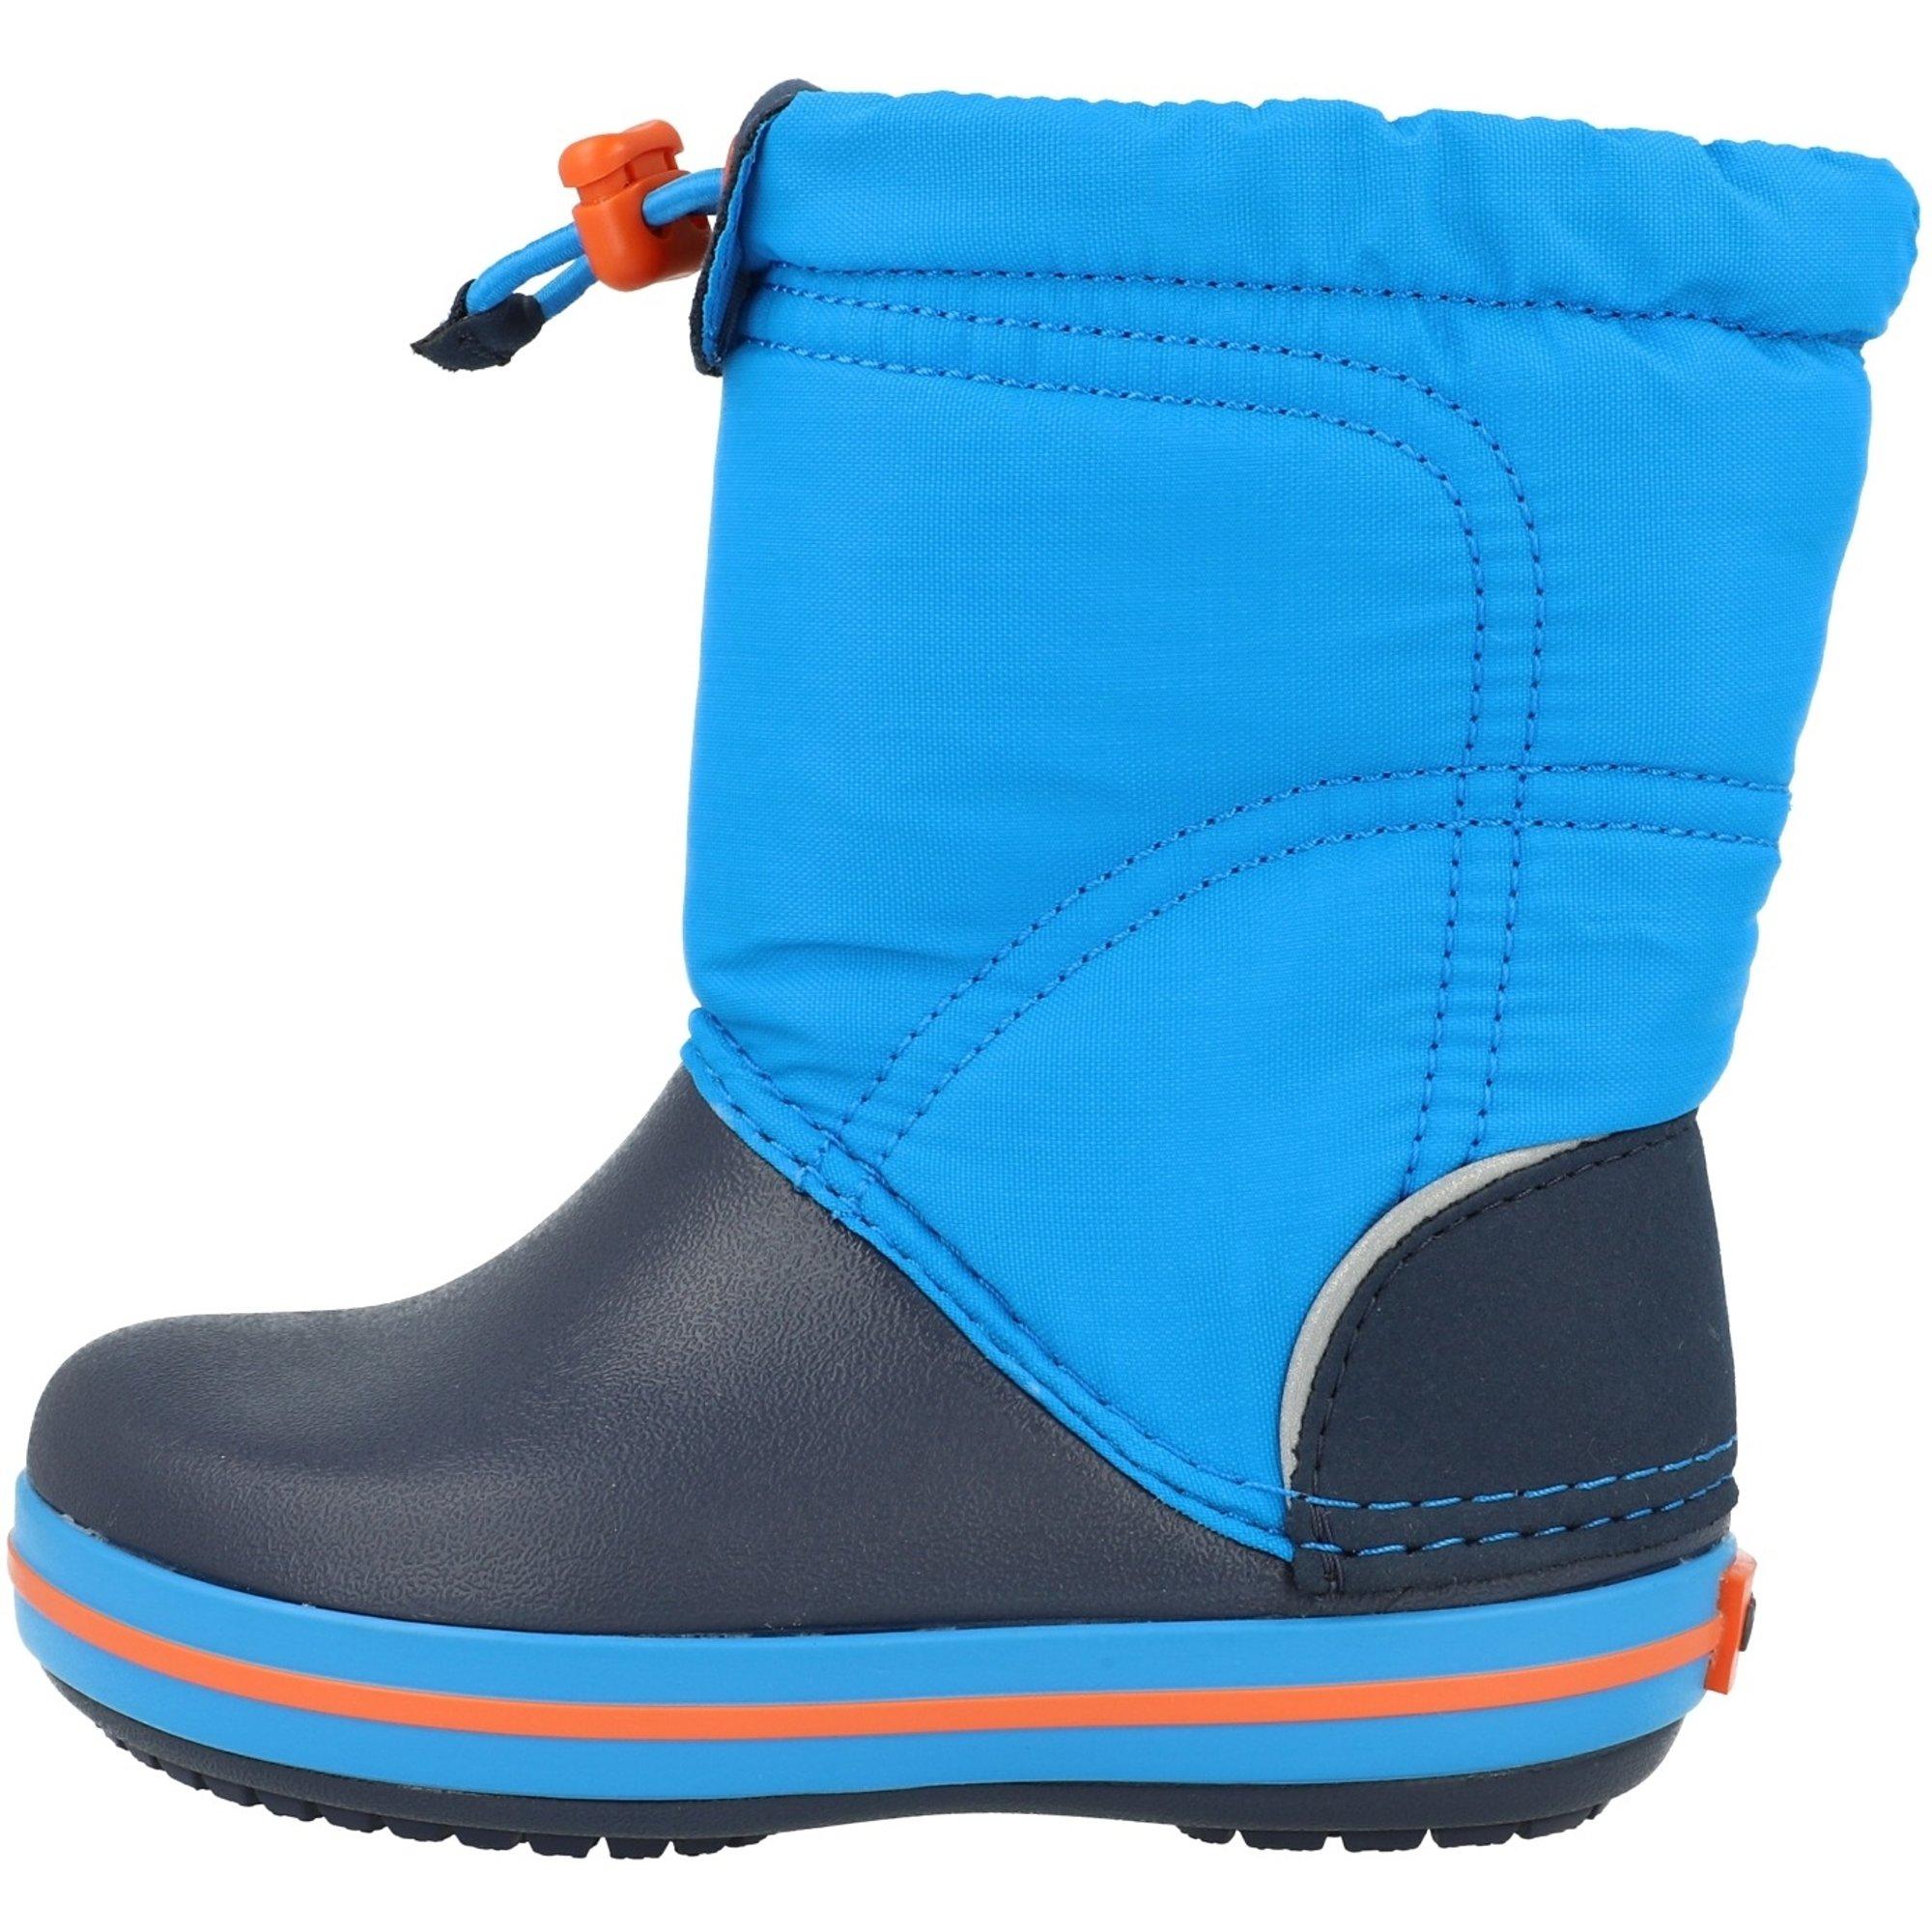 Crocs Kids Crocband Lodgepoint Boot